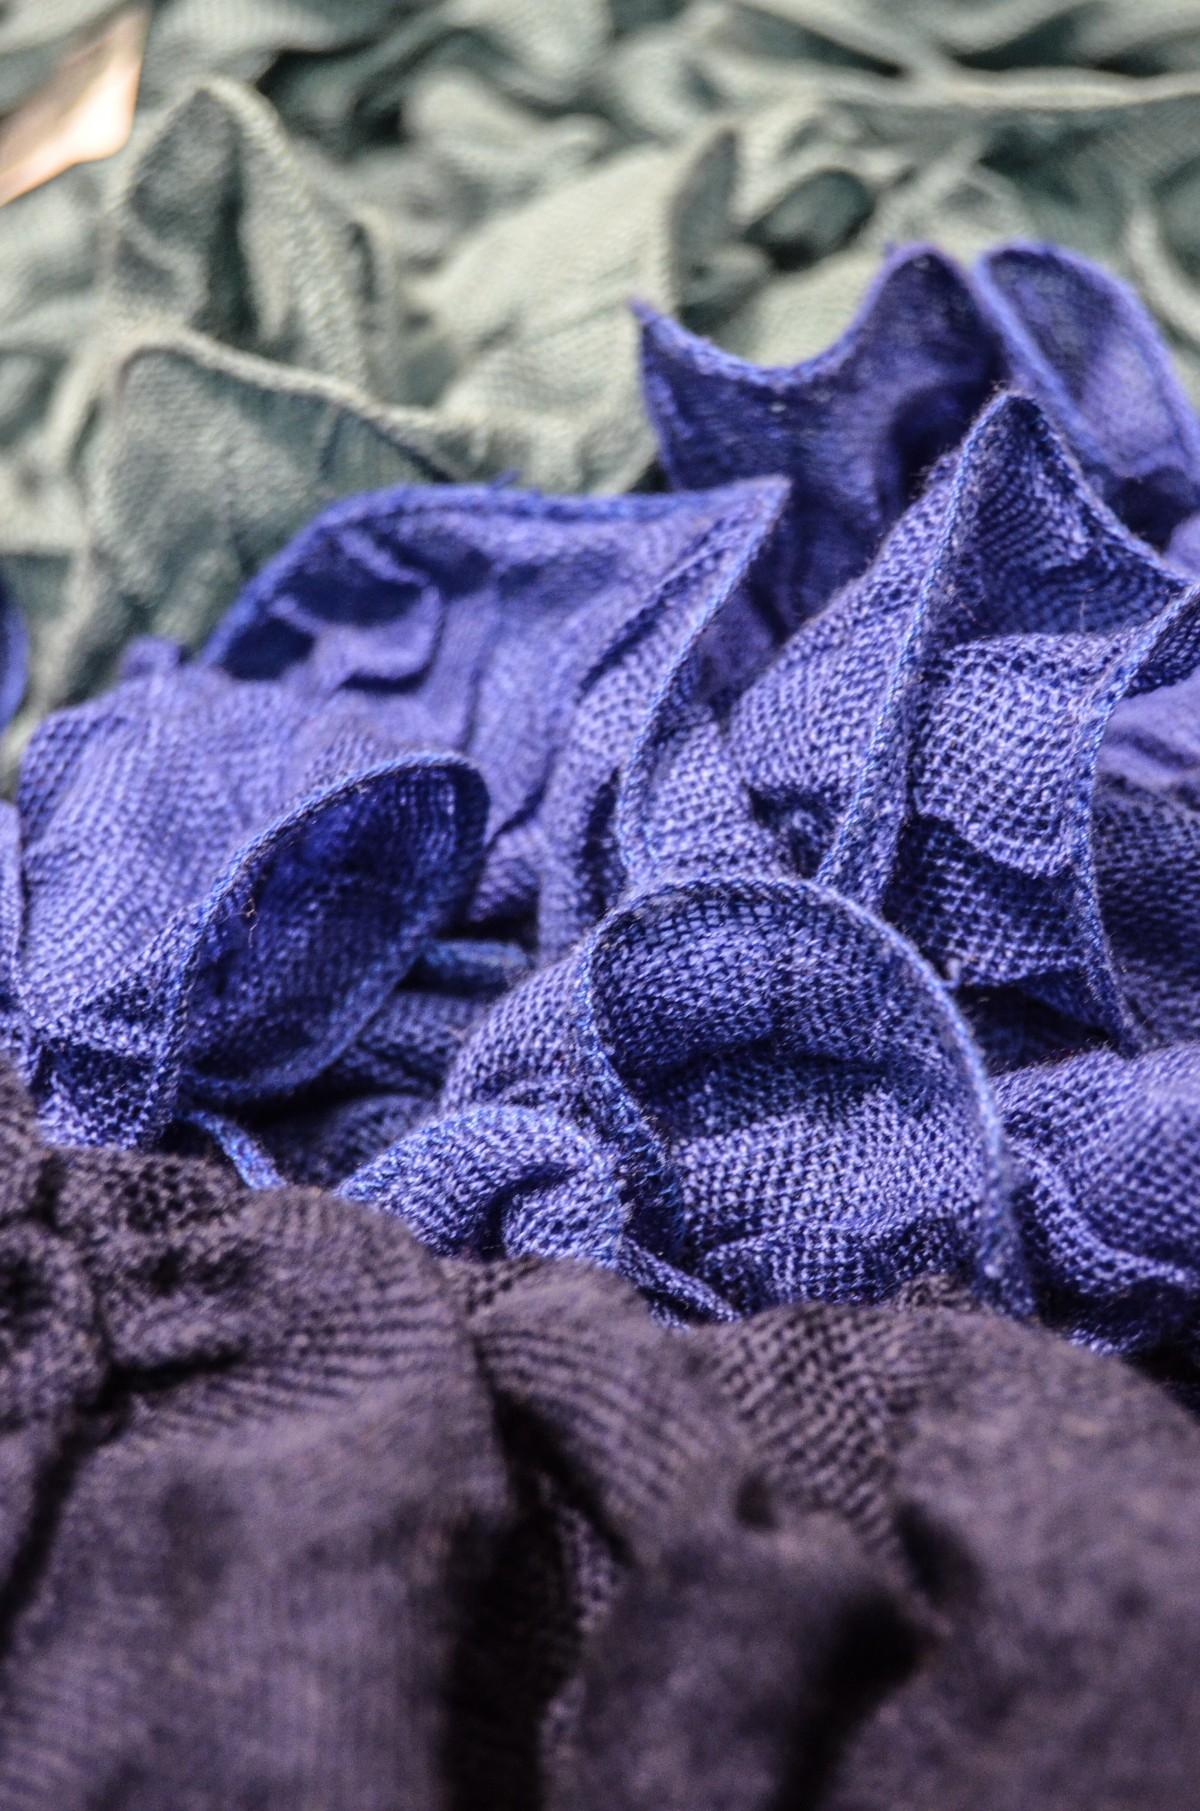 Kostenlose foto : Textur, Blume, lila, Web, Muster, blau, Kleidung ...